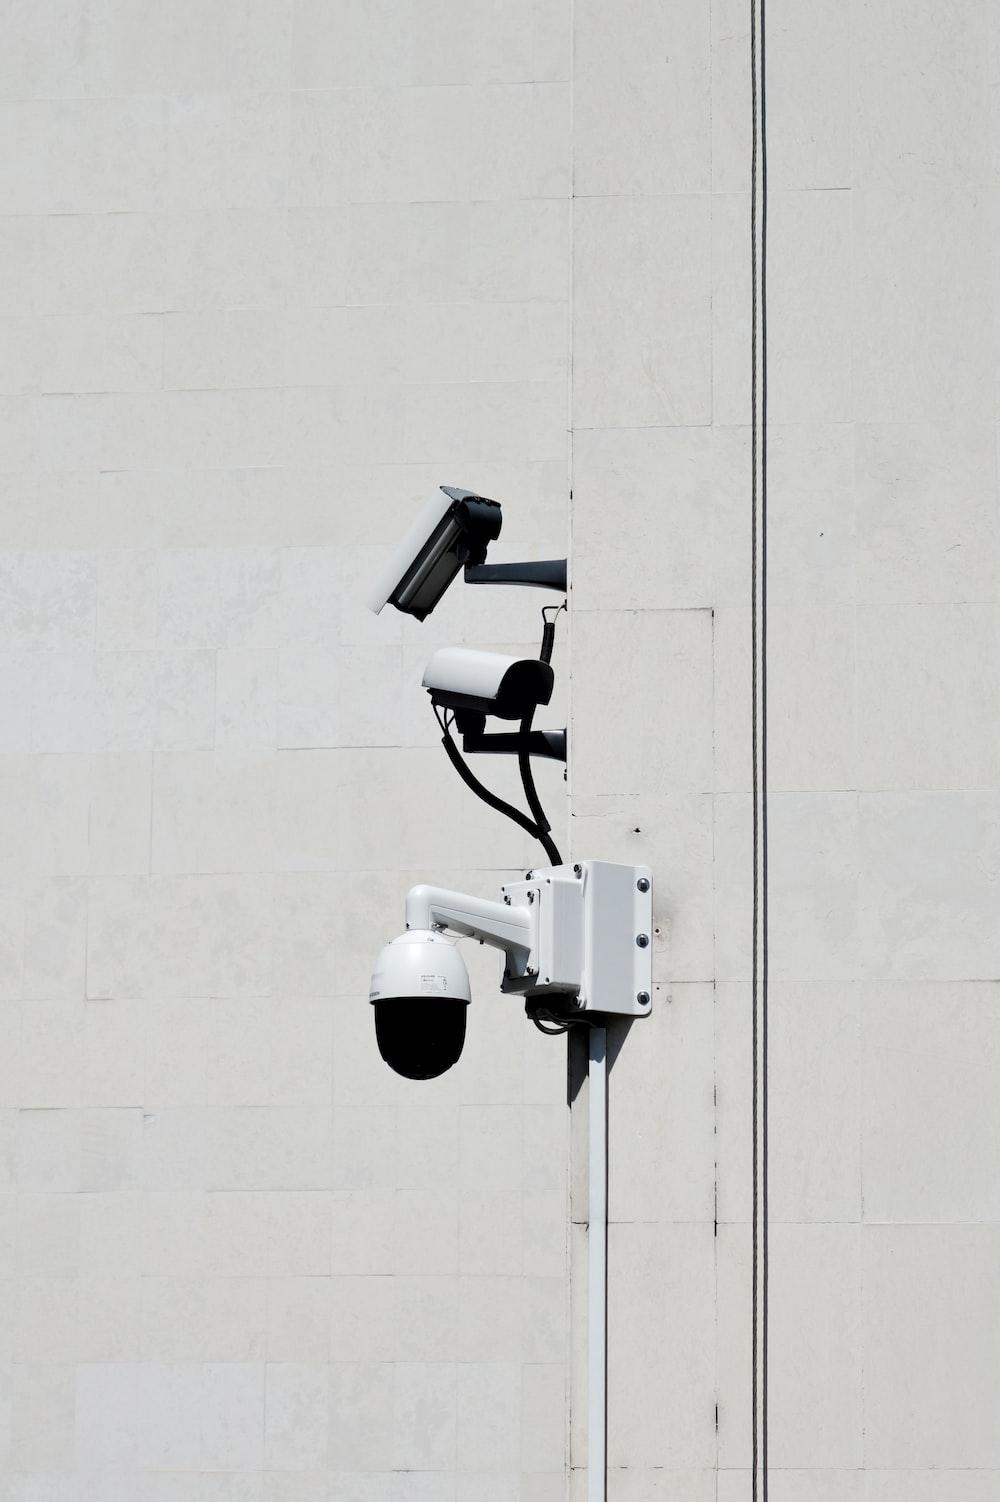 white CCTV cameras during daytime